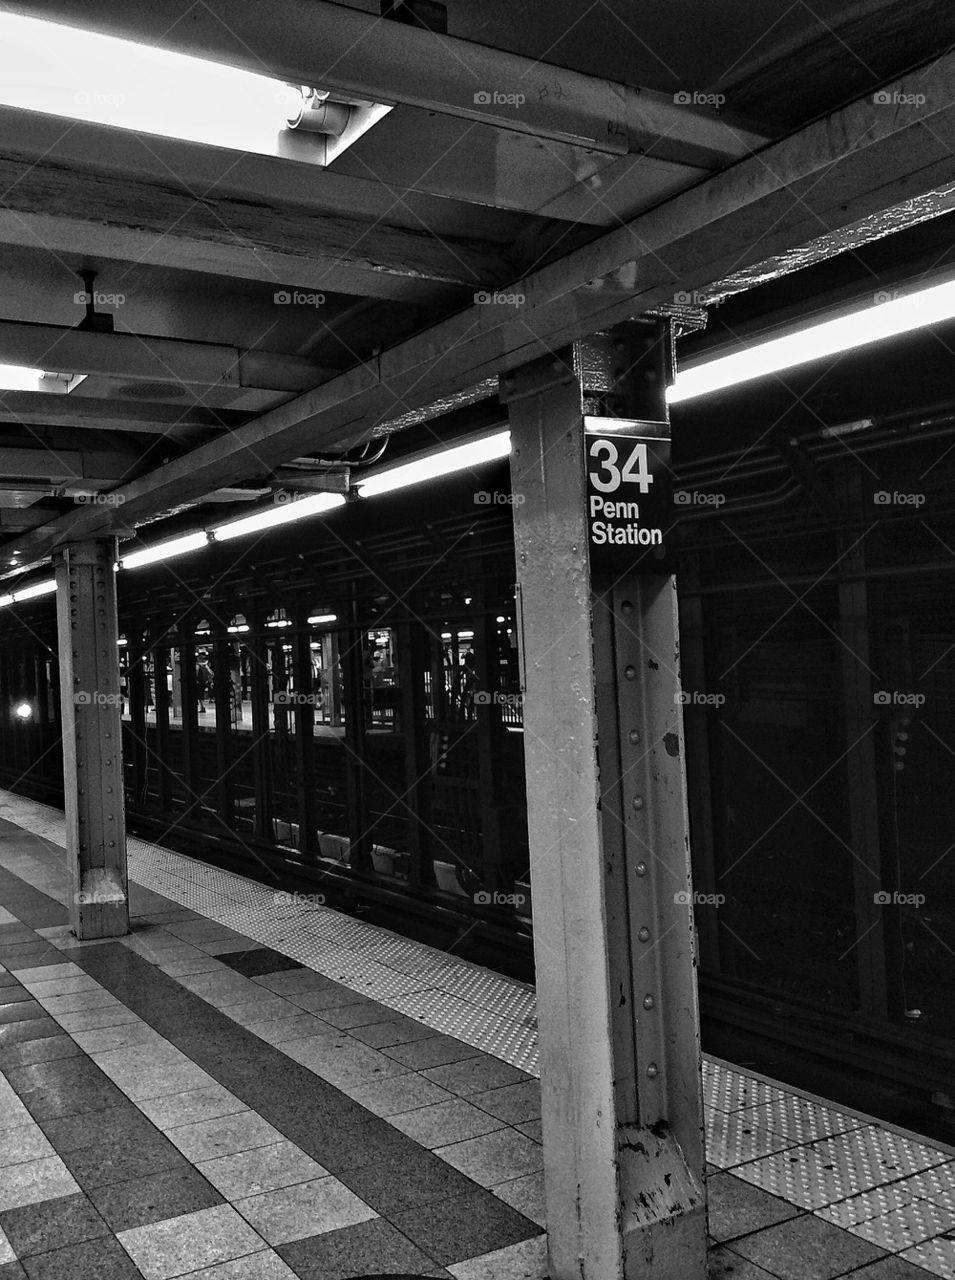 Penn Station Subway Stop